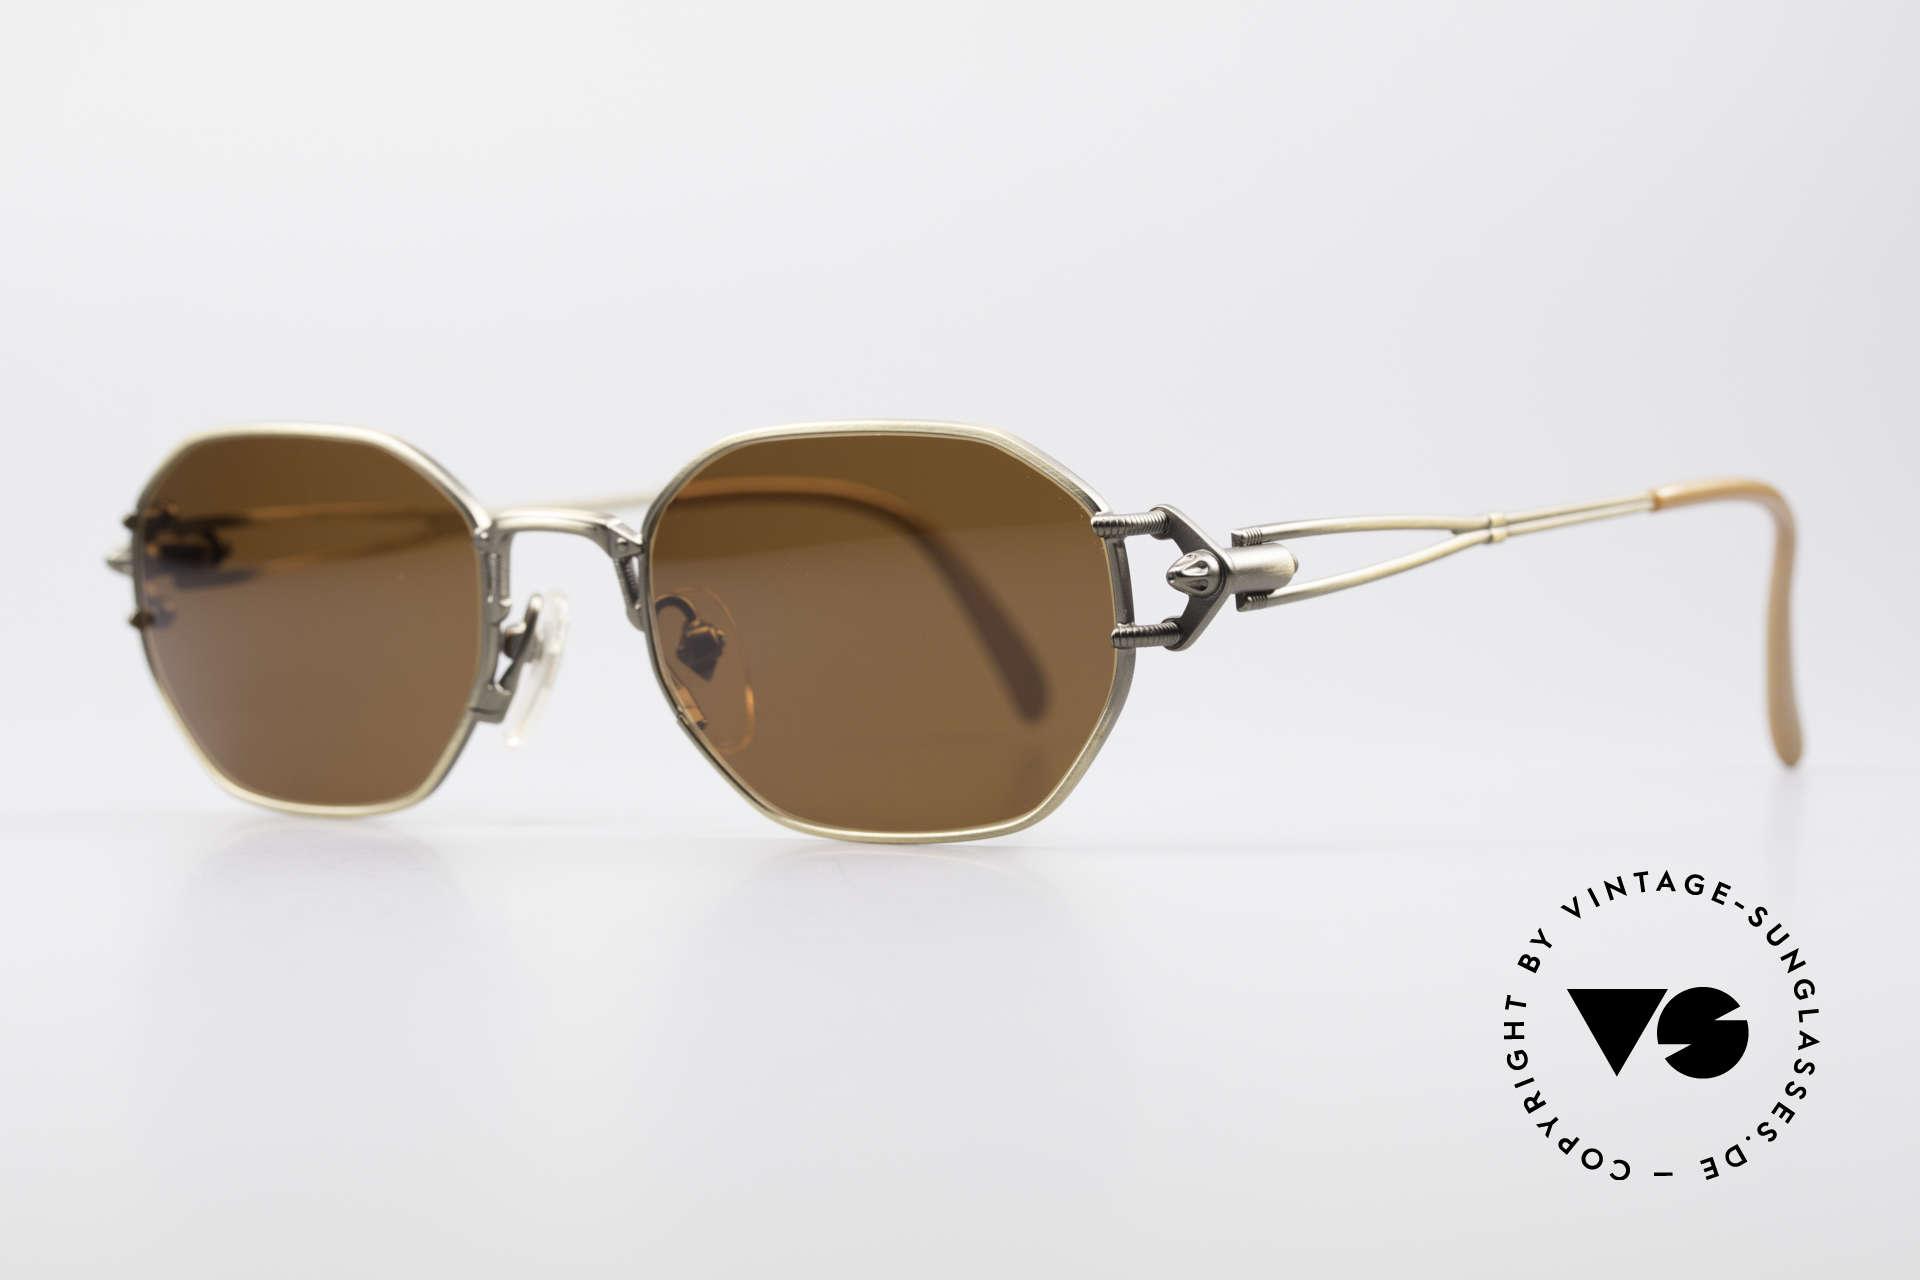 Jean Paul Gaultier 55-6106 90's Designer Sunglasses, 'mechanical design' = distinctive GAULTIER collection, Made for Men and Women